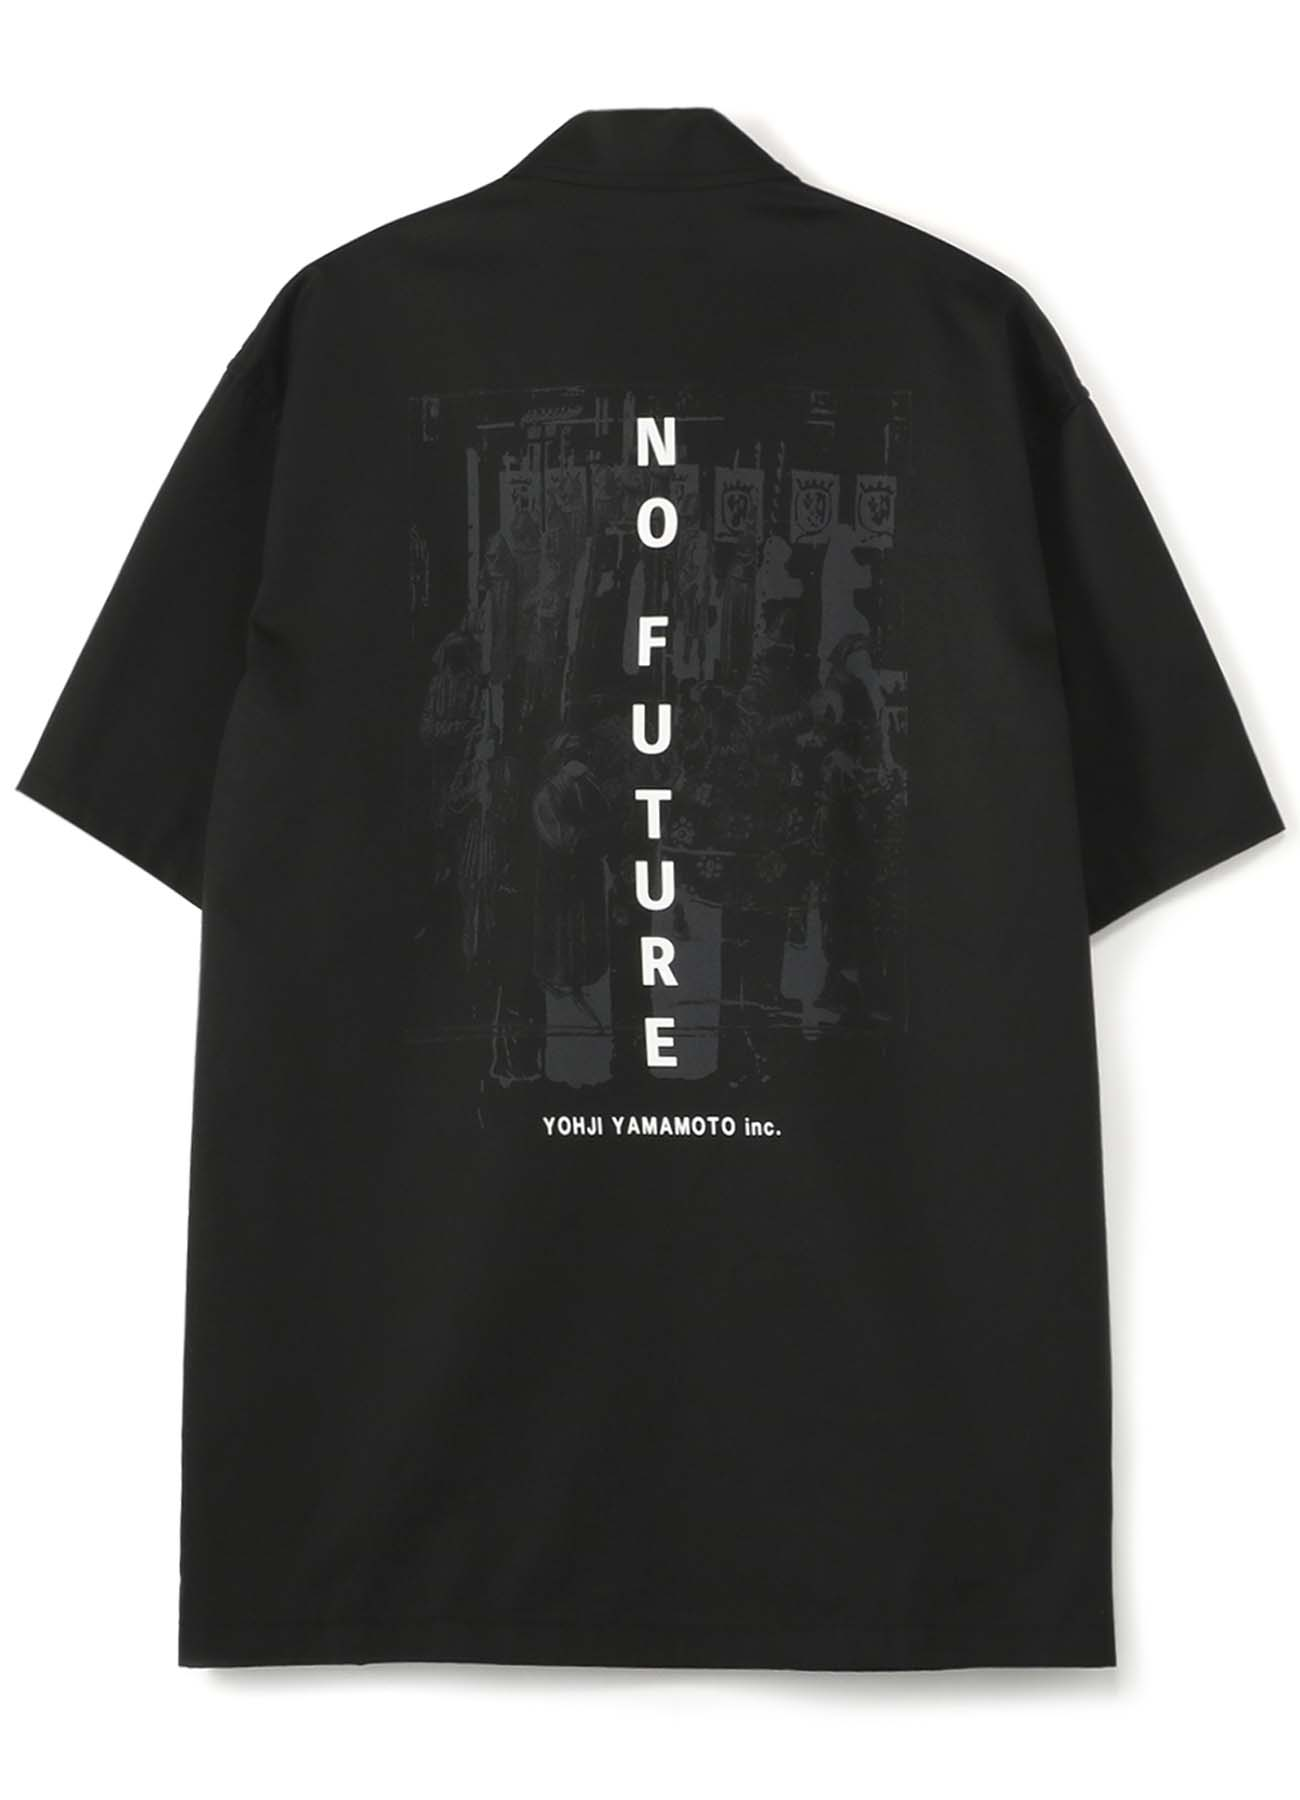 30s Combed Burberry [NO FUTURE] Zipper Shirt